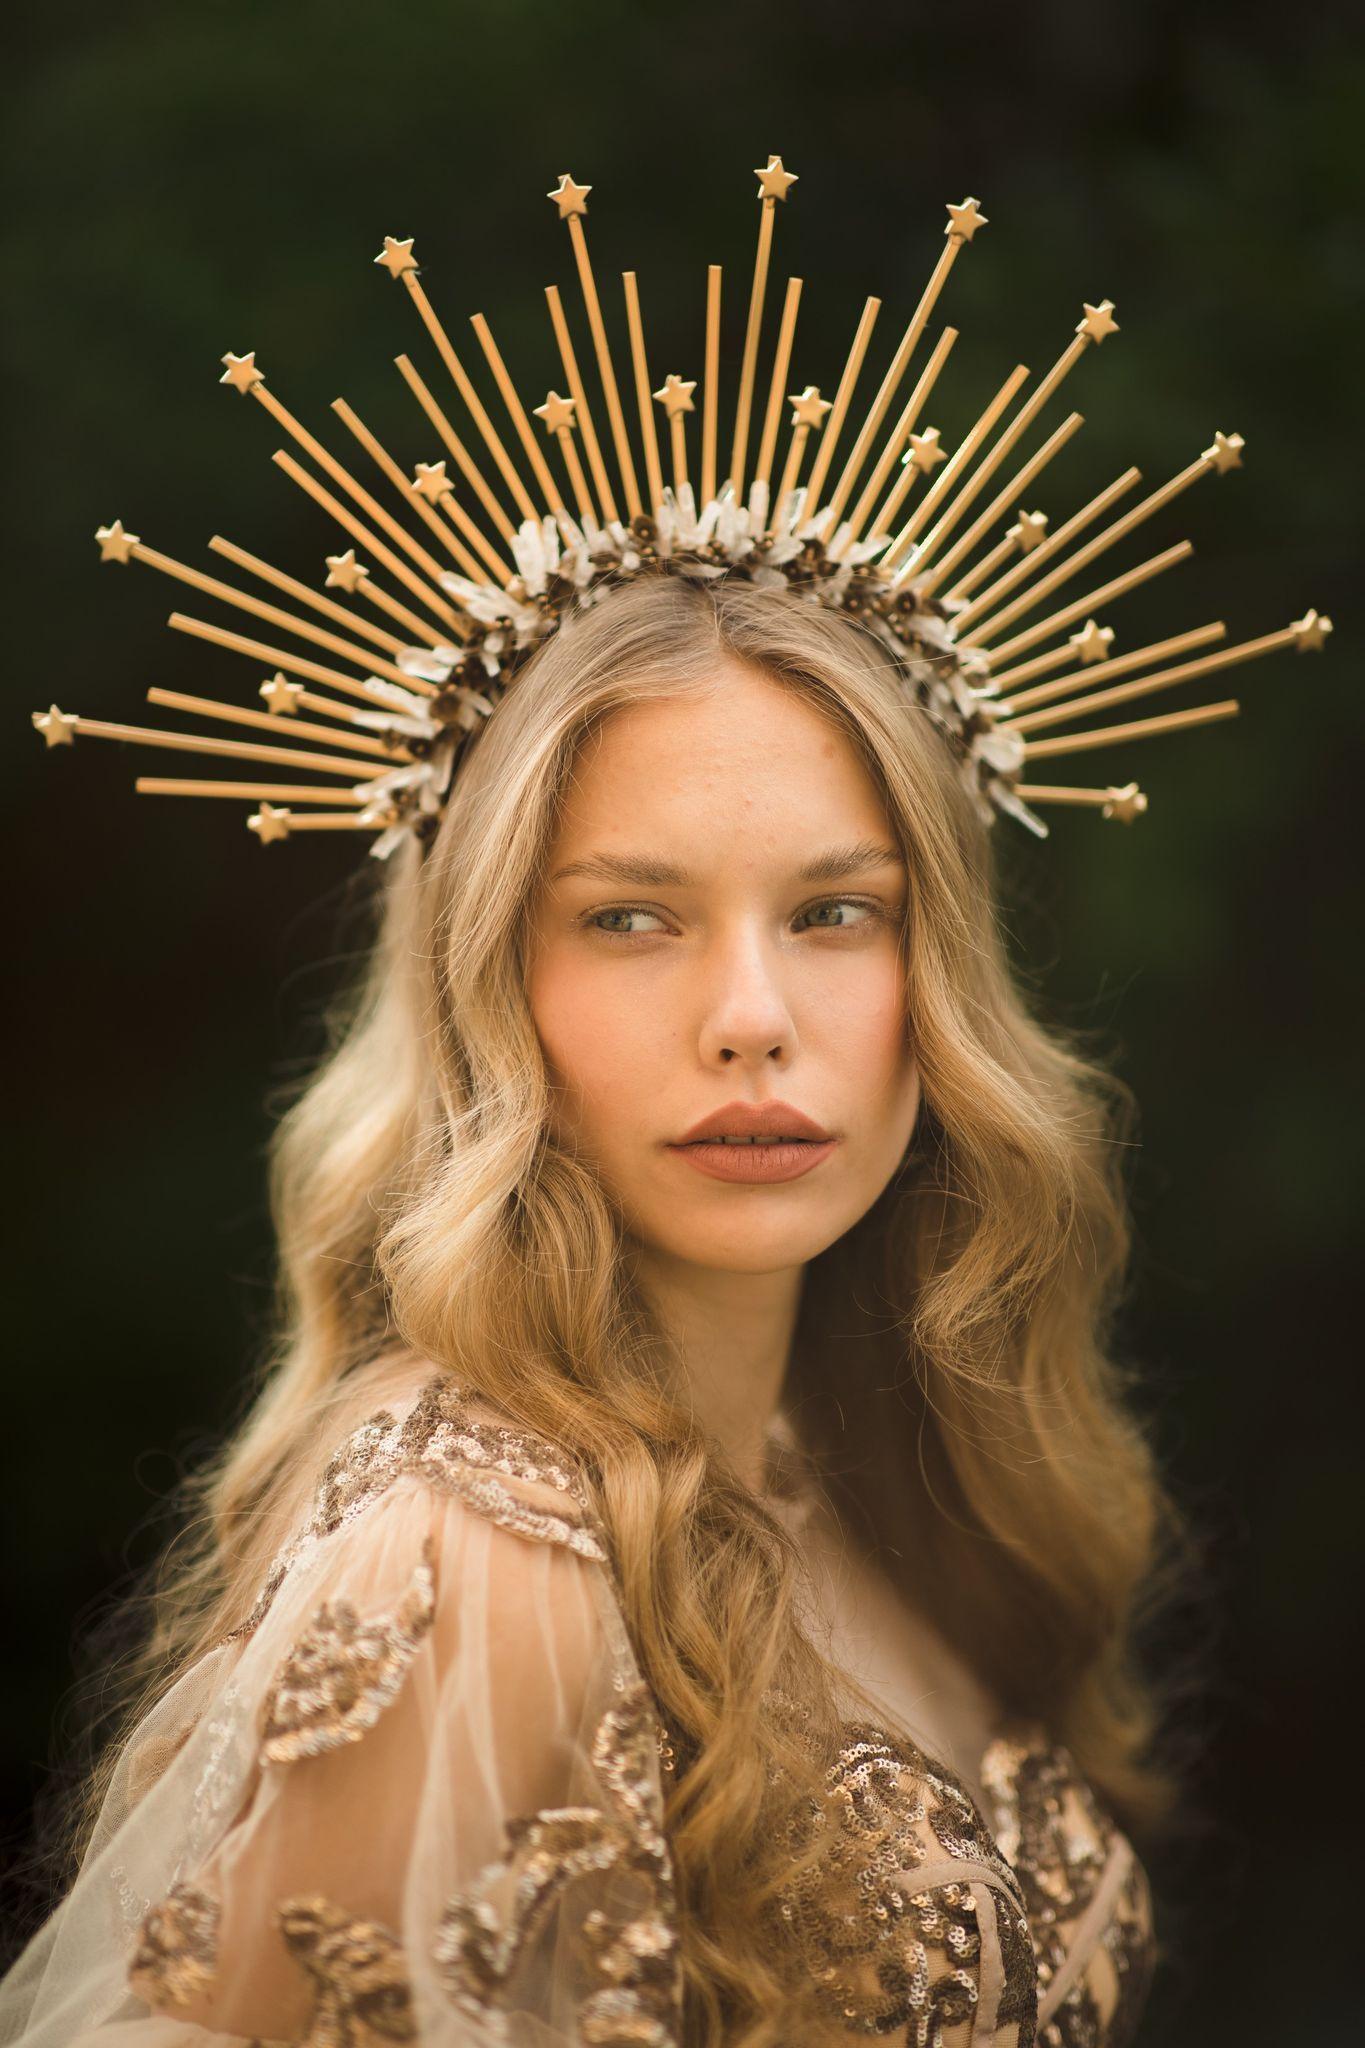 Gold Crystal Halo Crown Fashion Headband Goddess headdress Halo Crown Star Crystal Rhinestone Gold Halo Spiked Headpiece  Sunburst Crown